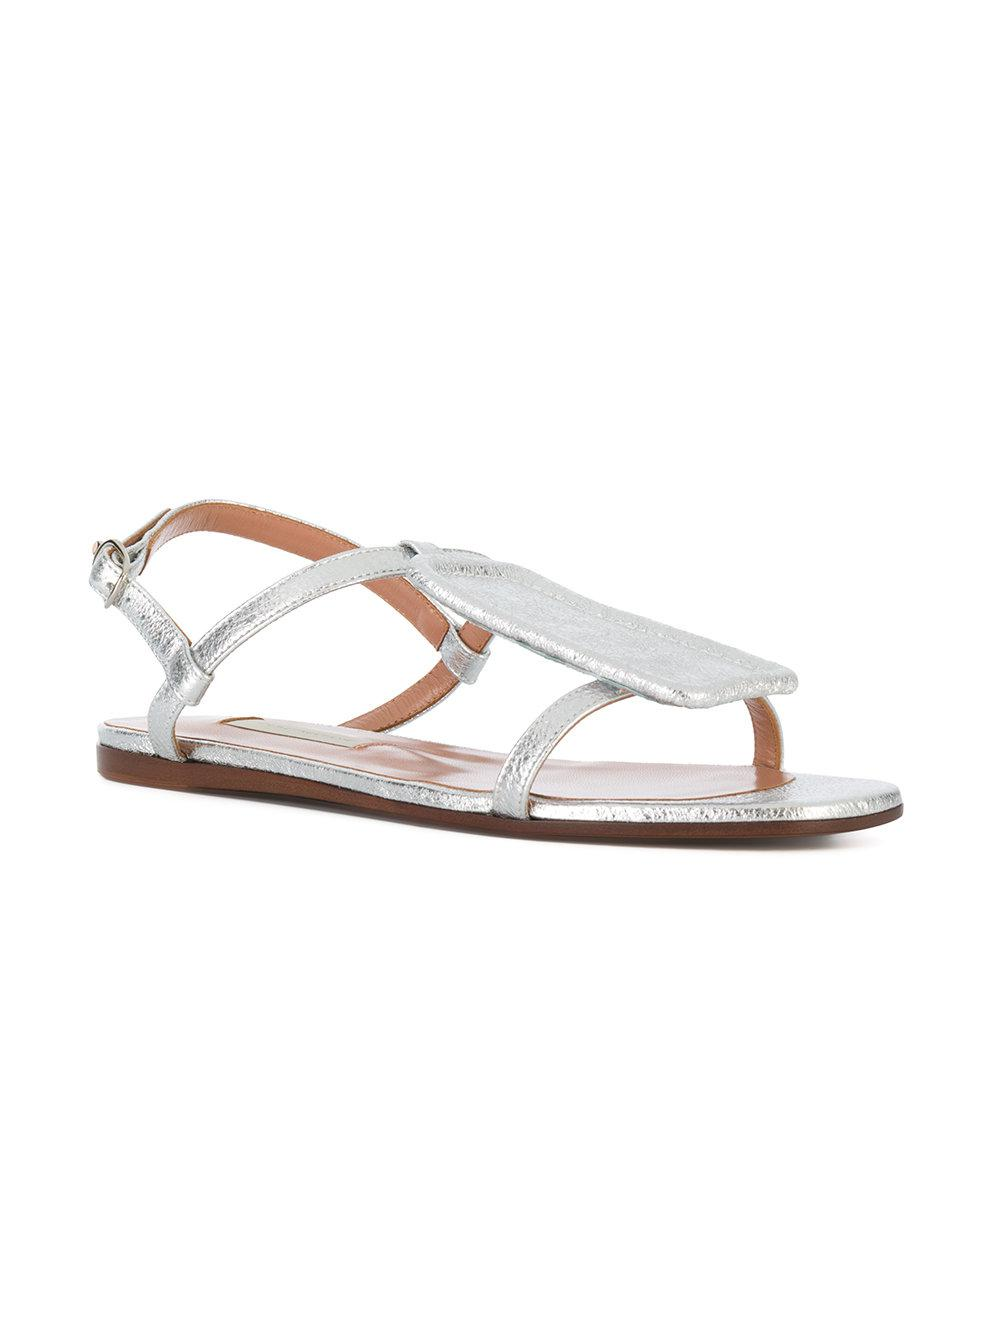 laminated sandals - Metallic L'autre Chose 3f8Ha1